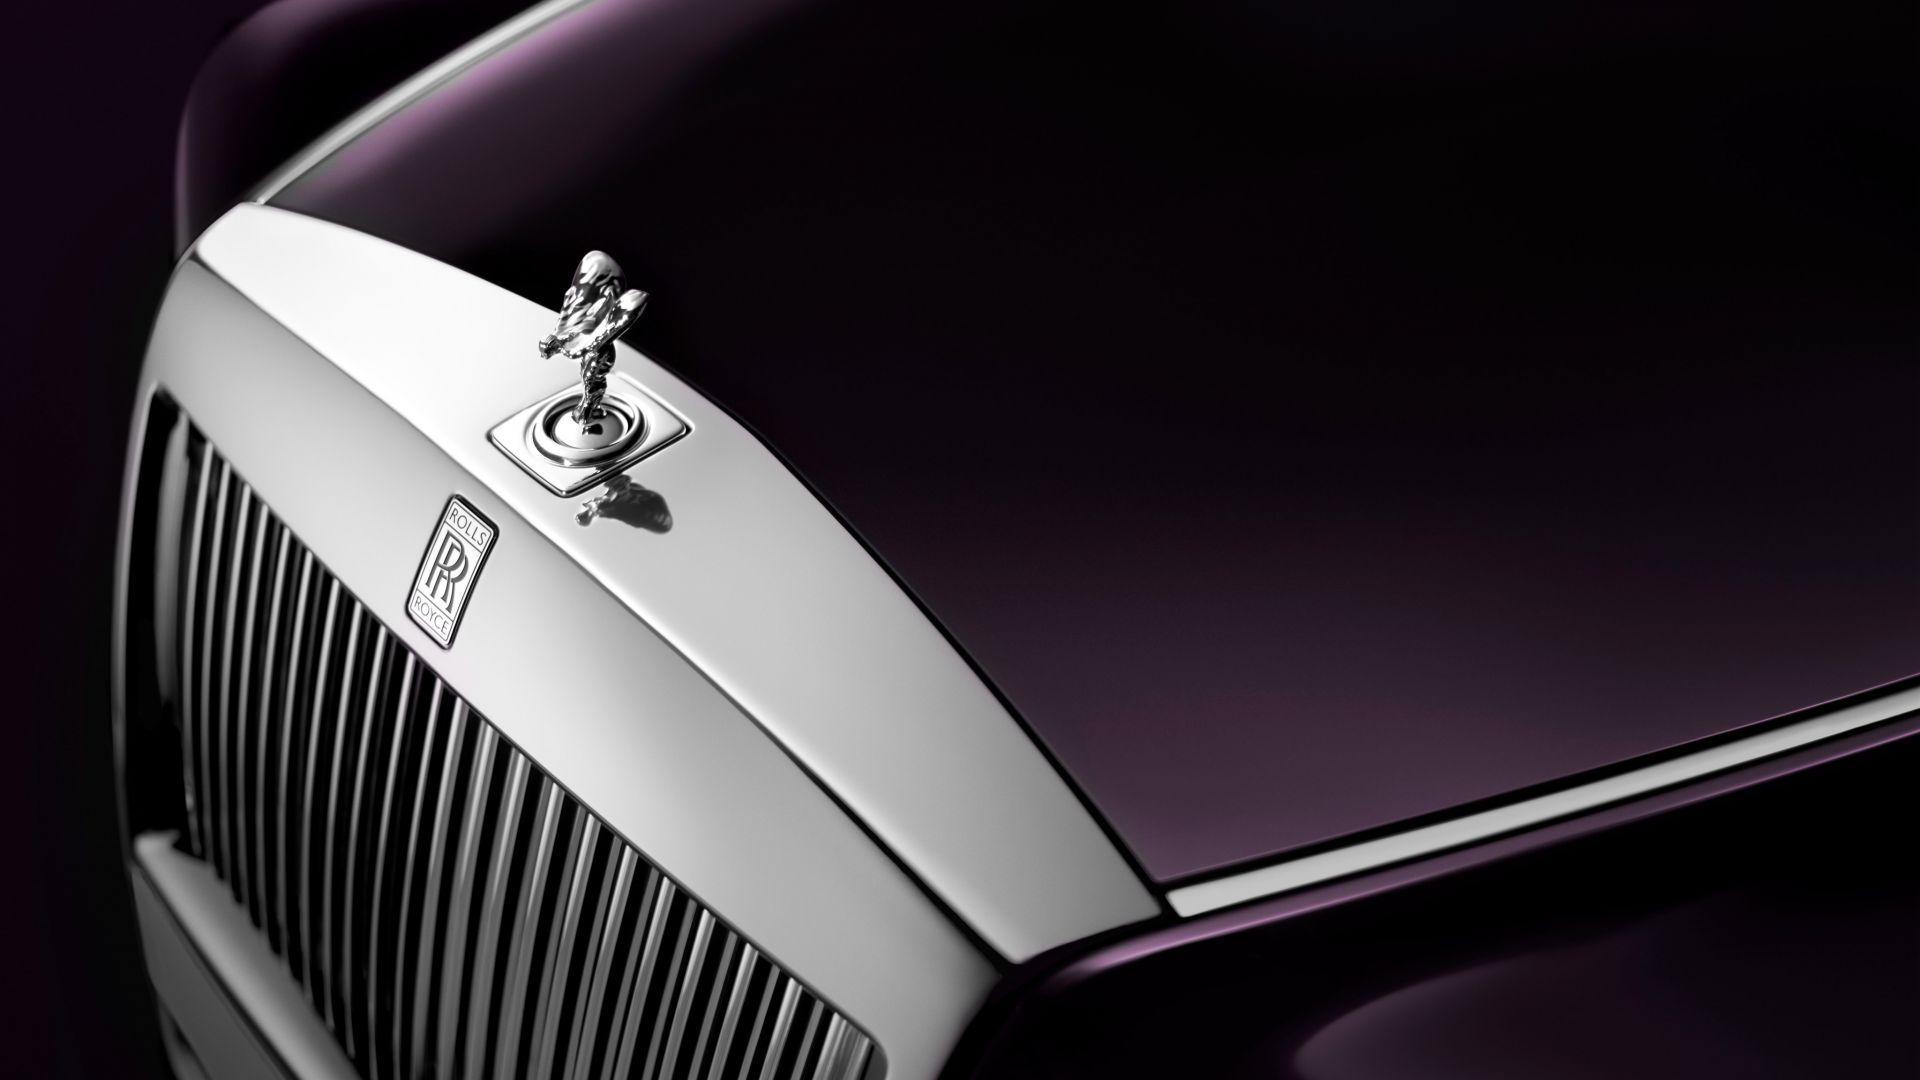 Desktop Wallpaper 2017 Rolls Royce Phantom Front Logo Hd Image Picture Background D96cbb